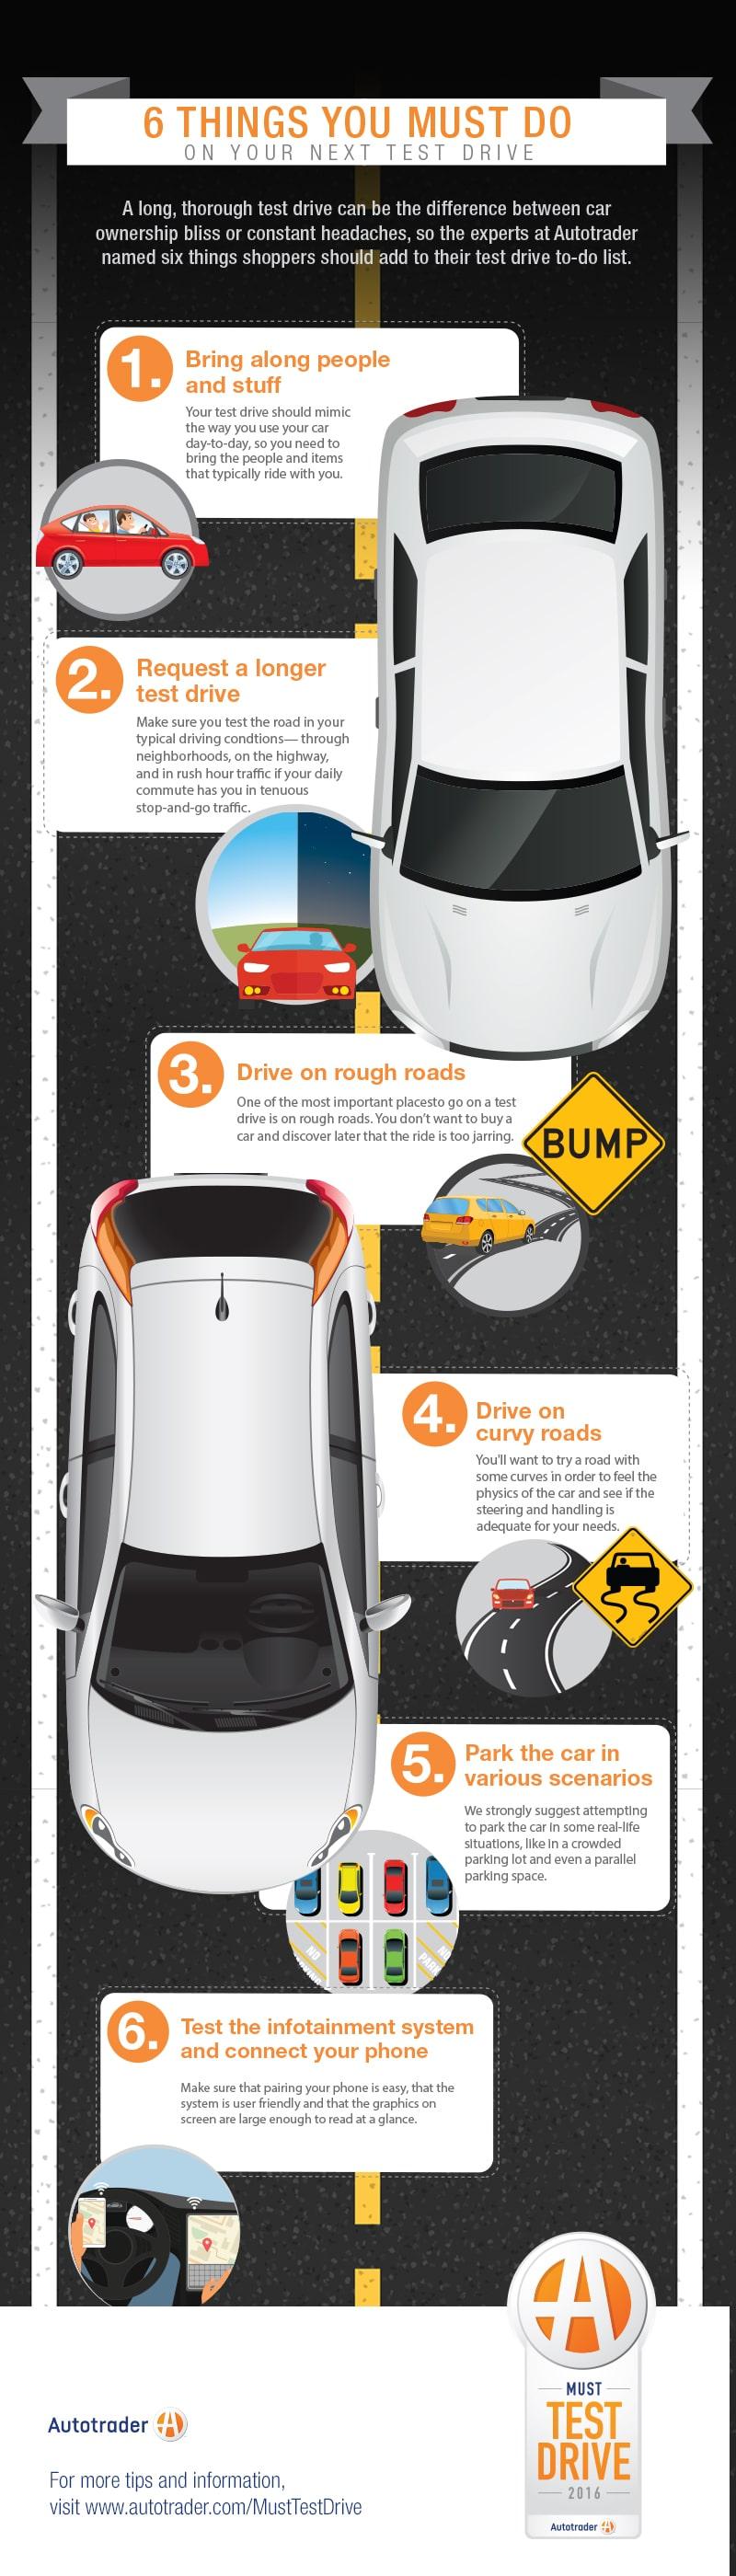 Autotrader TestDriveTips_infographic-800x2800 (1)